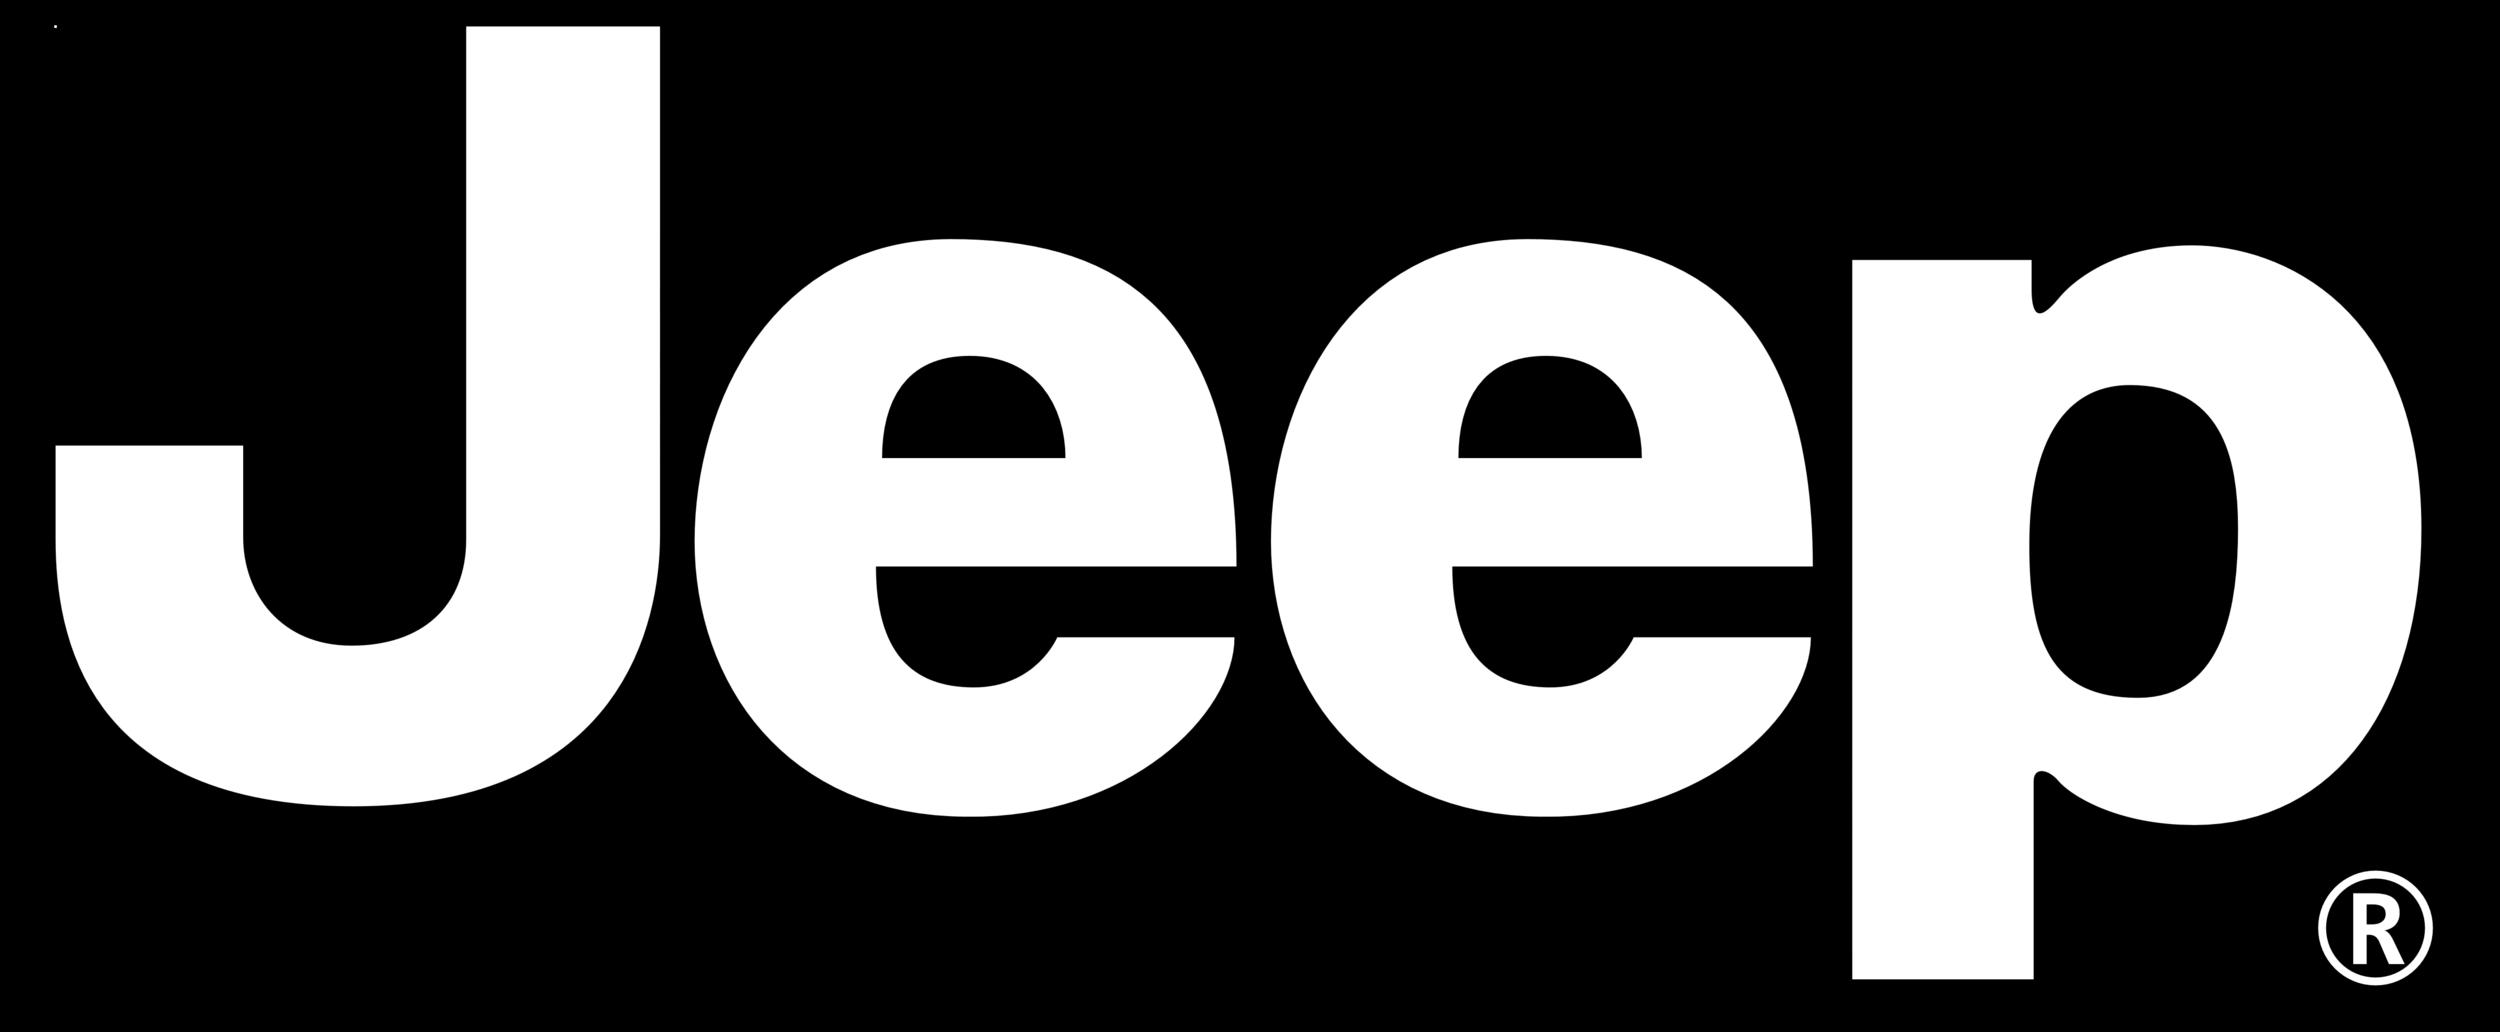 Jeep_logo_black_background.png